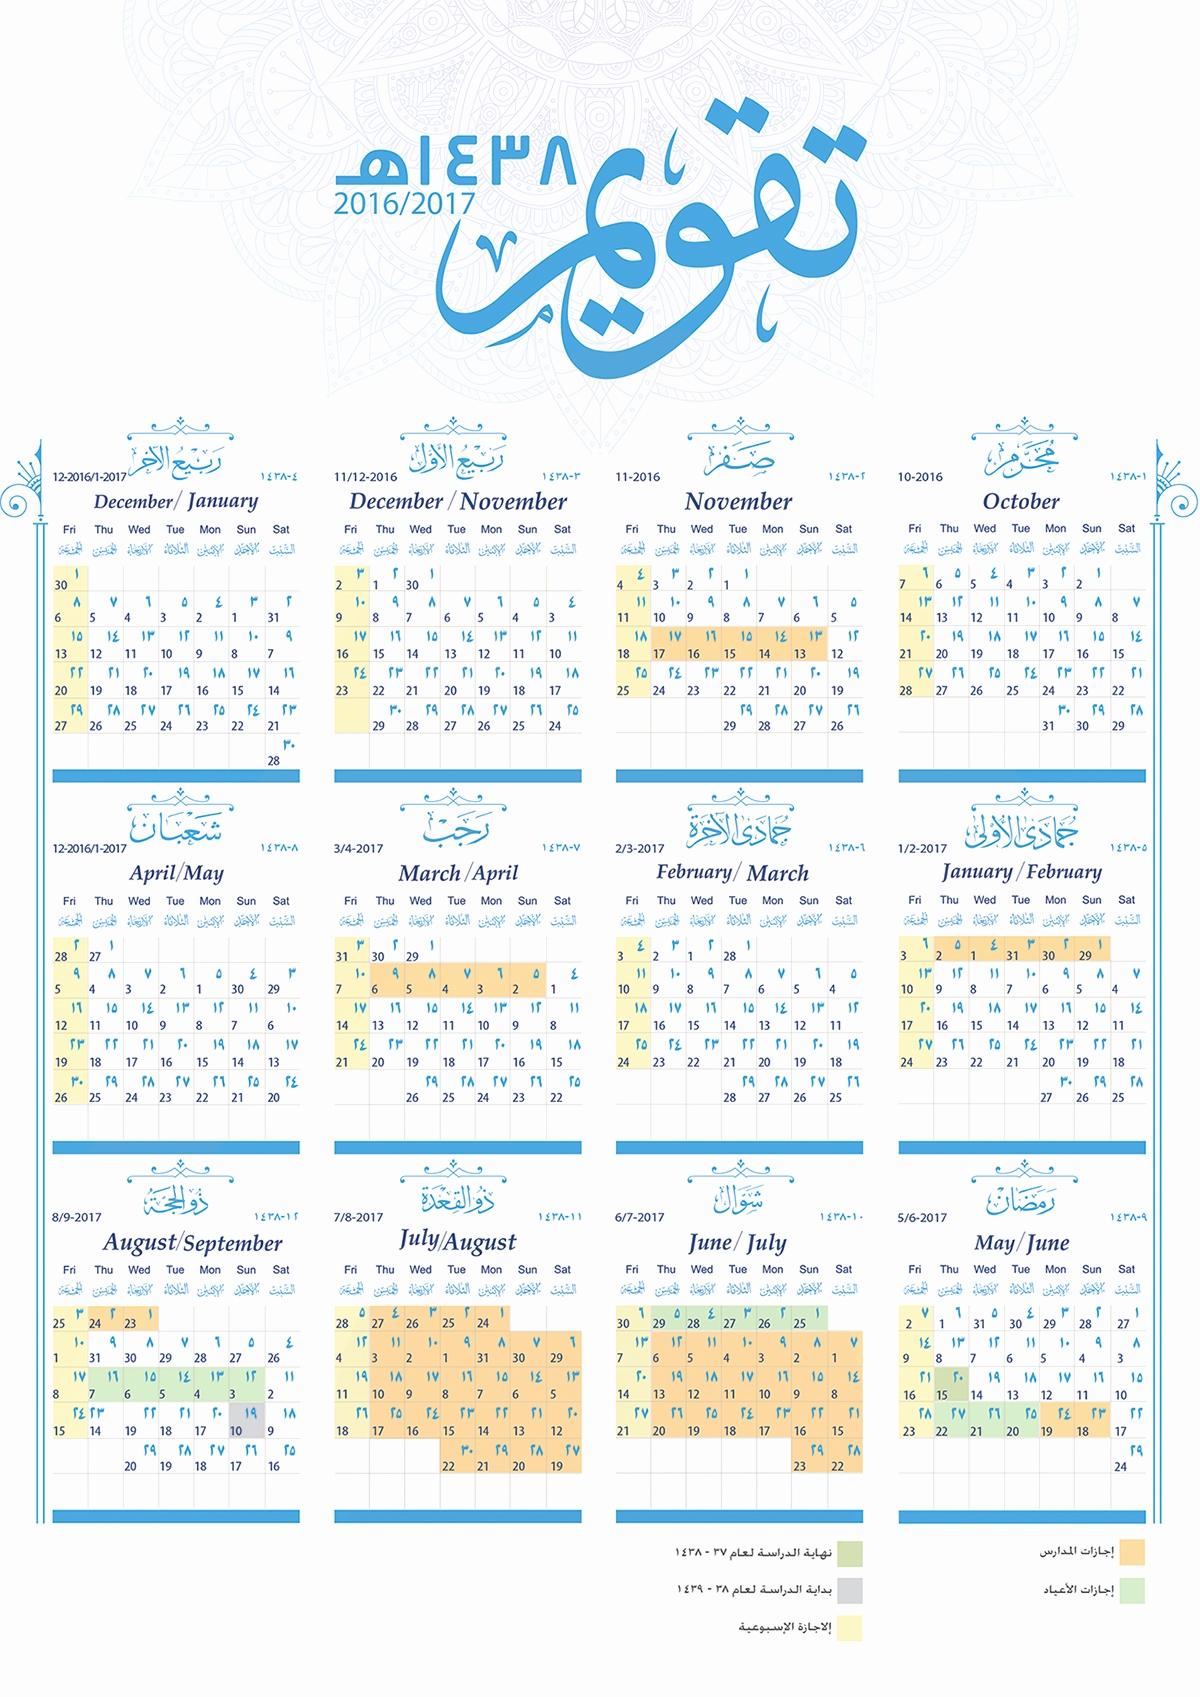 Https://bhsvps/51-Hijri-Calendar-2019-Hijri-Calendar-1438-2019 throughout Islamic Year Hijri 1438 Images